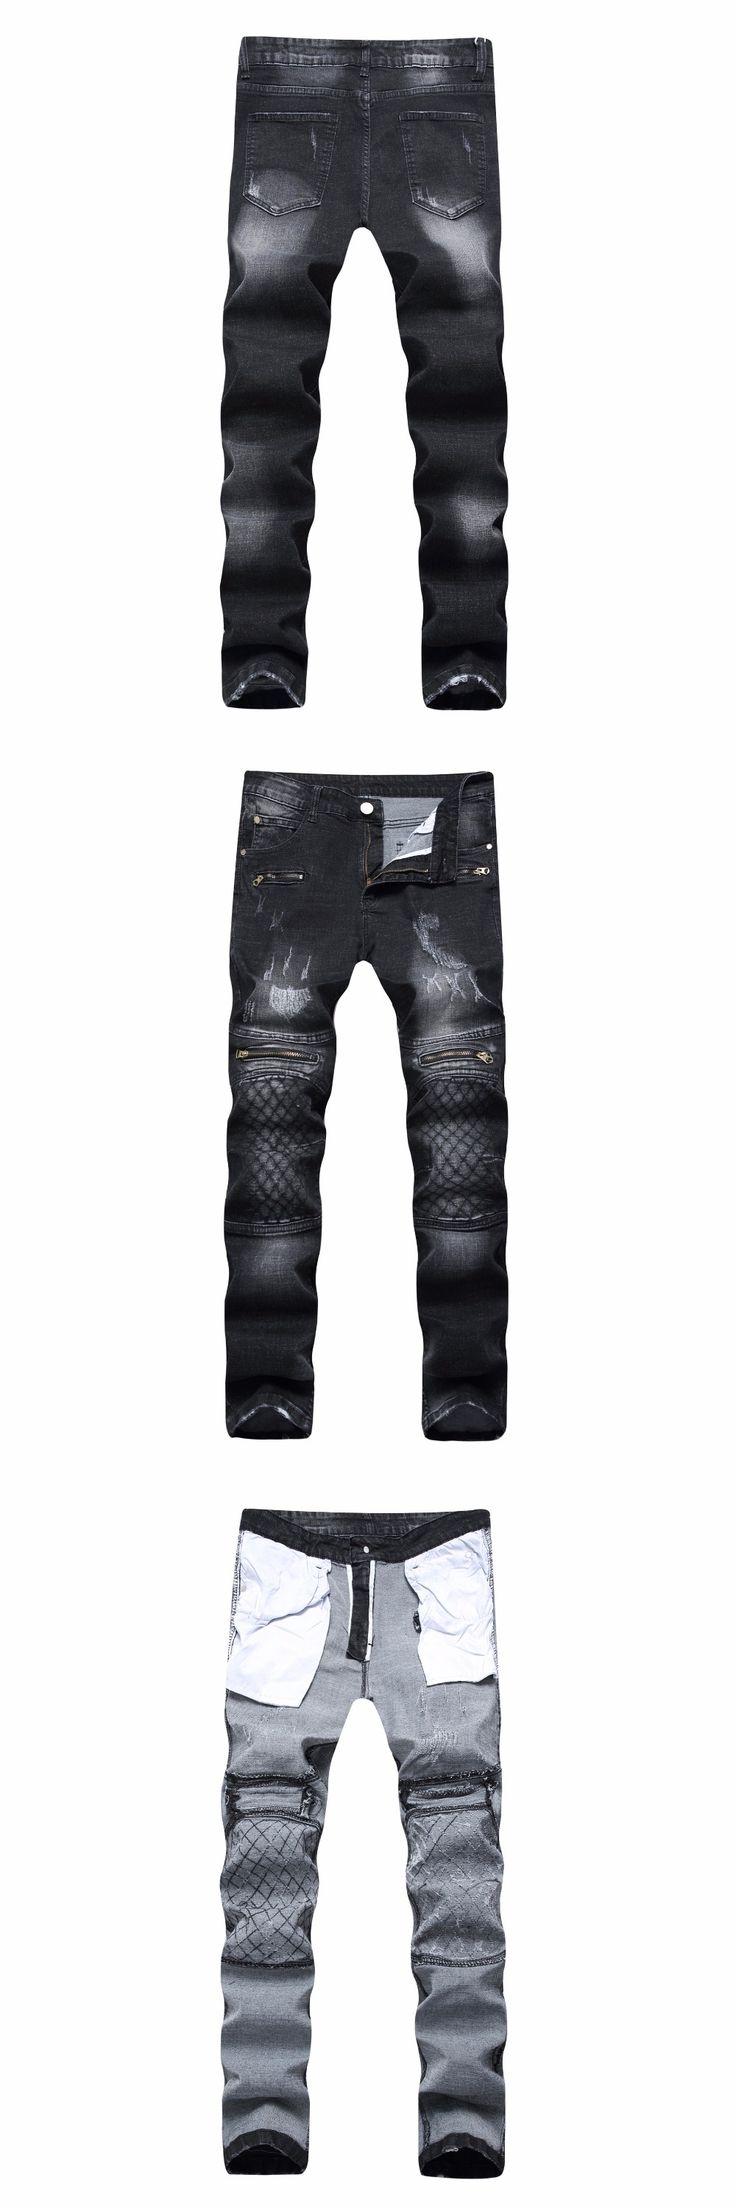 2018 New Men's Ripped Pencil Stretch Moto Jeans Holes Slim Fit Long Skinny Cotton Punk Biker Mens Skinny Black Plus Size Pants